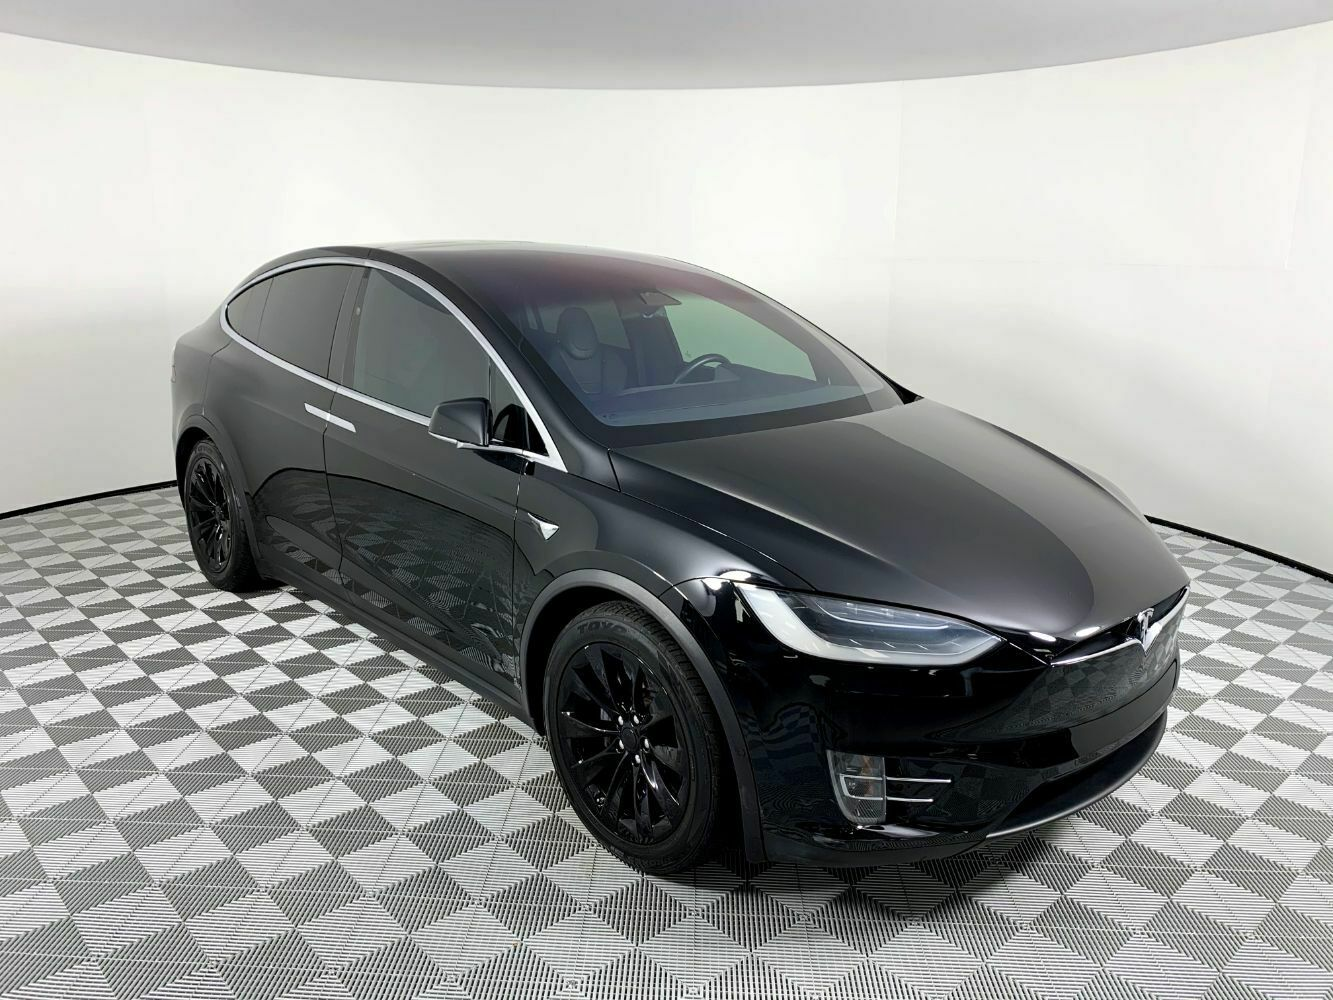 2017 Tesla Model X 100d 23502 Miles Black Sport Utility 4 ...